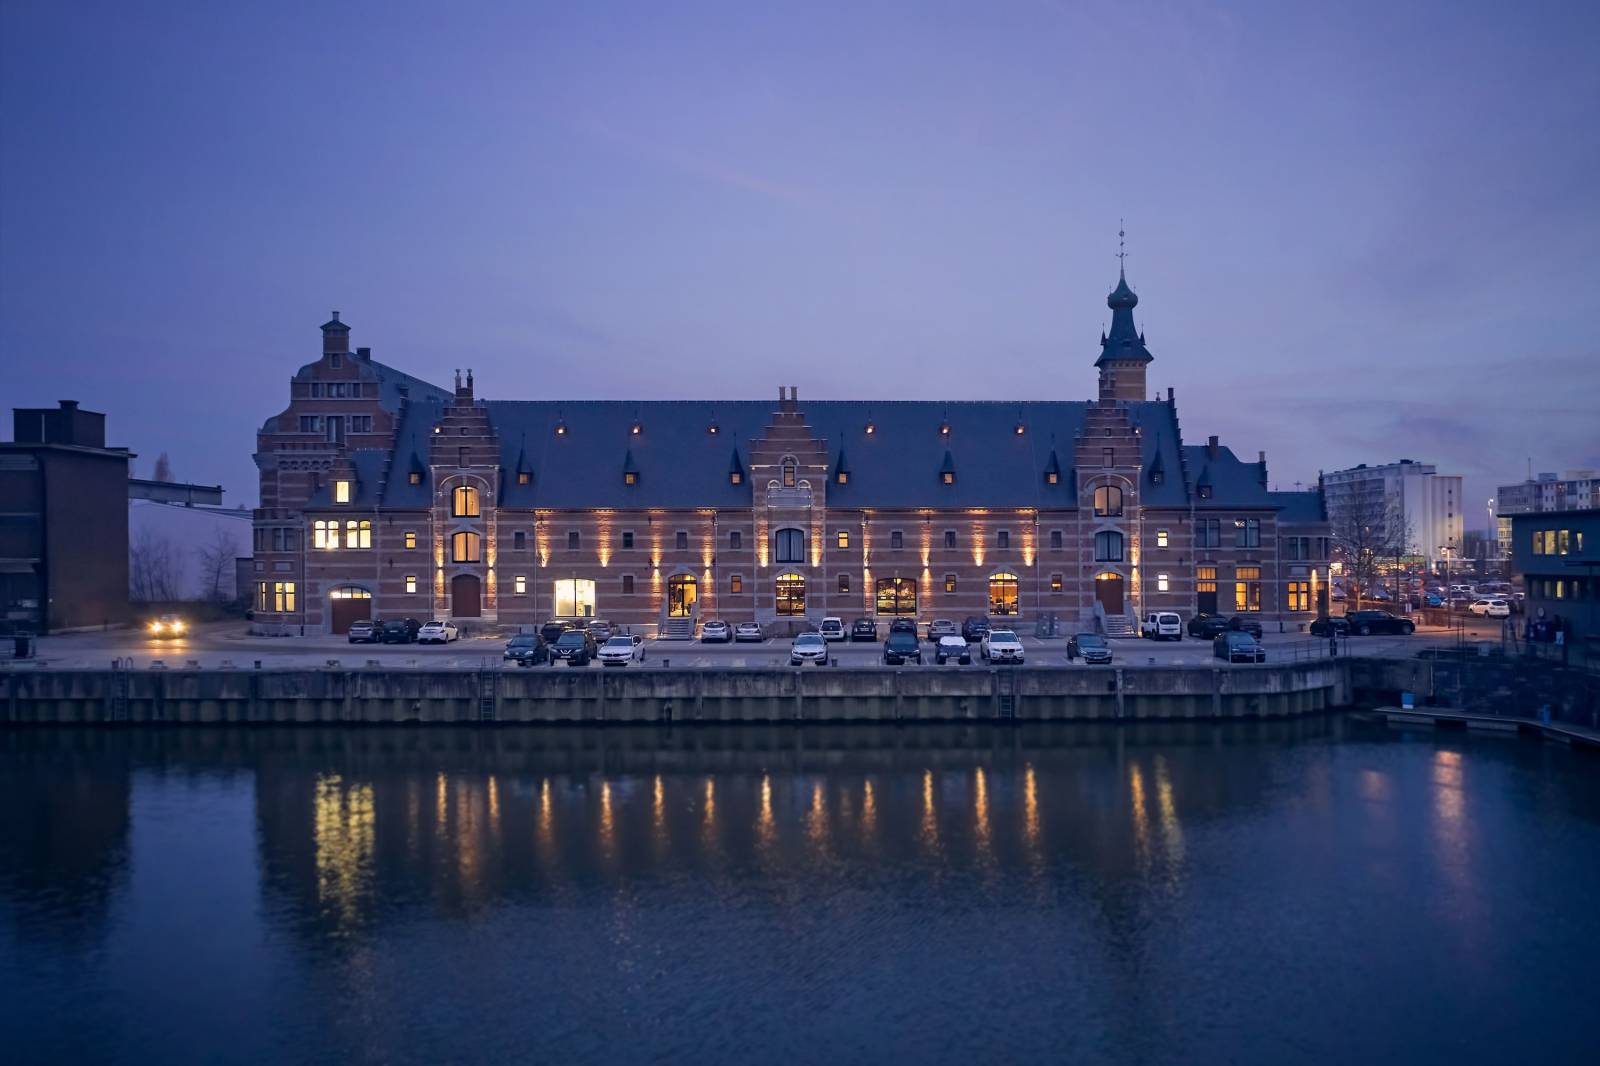 Feestal - Van der Valk hotel Mechelen - House of Weddings (7)